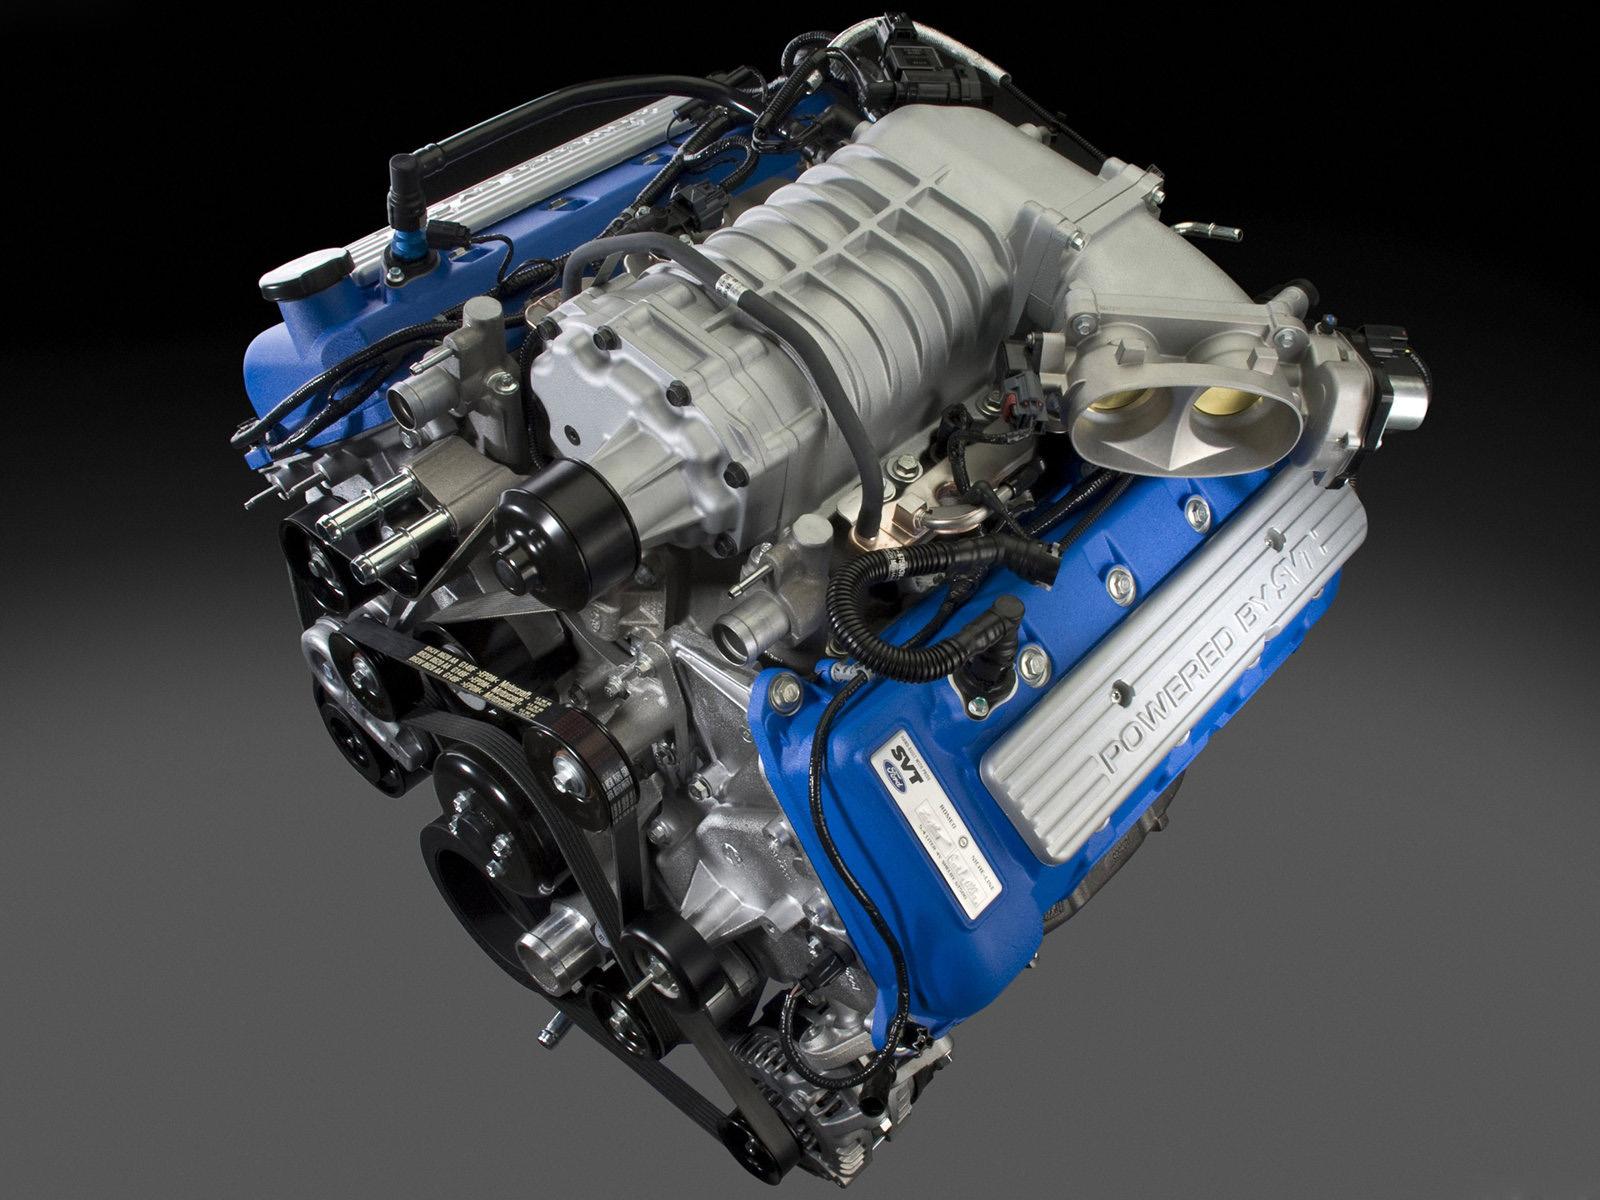 http://2.bp.blogspot.com/-1z4CMX434Cc/TzIVp9cBrJI/AAAAAAAAAd8/xp7EsB2TJLk/s1600/Ford_Mustang_Shelby_GT500_(2011)_03.jpg